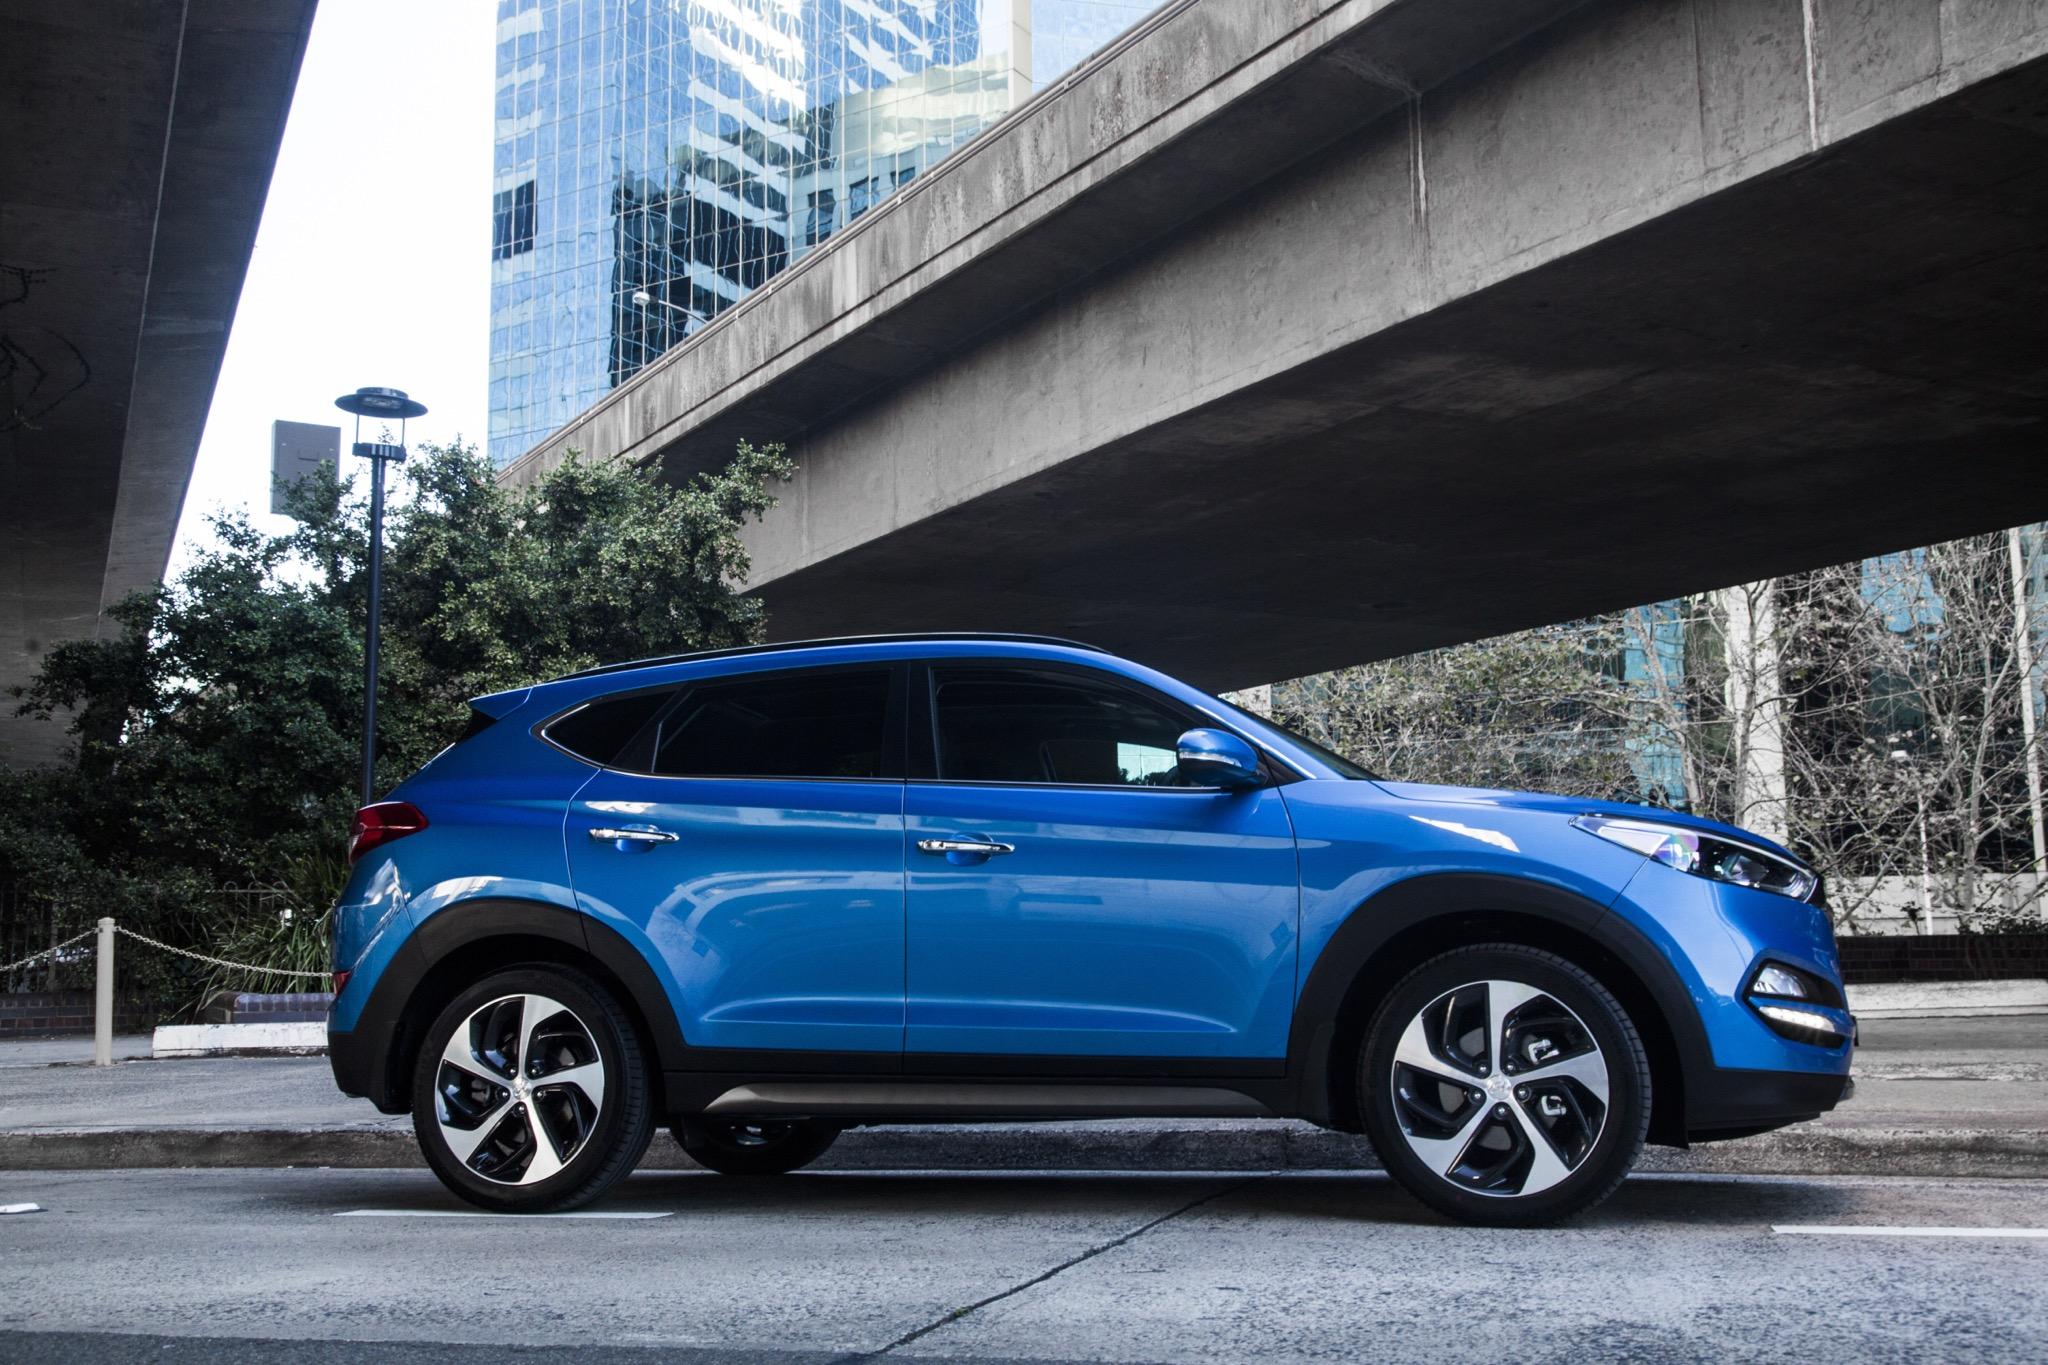 2016 Hyundai Tucson Review - Photos